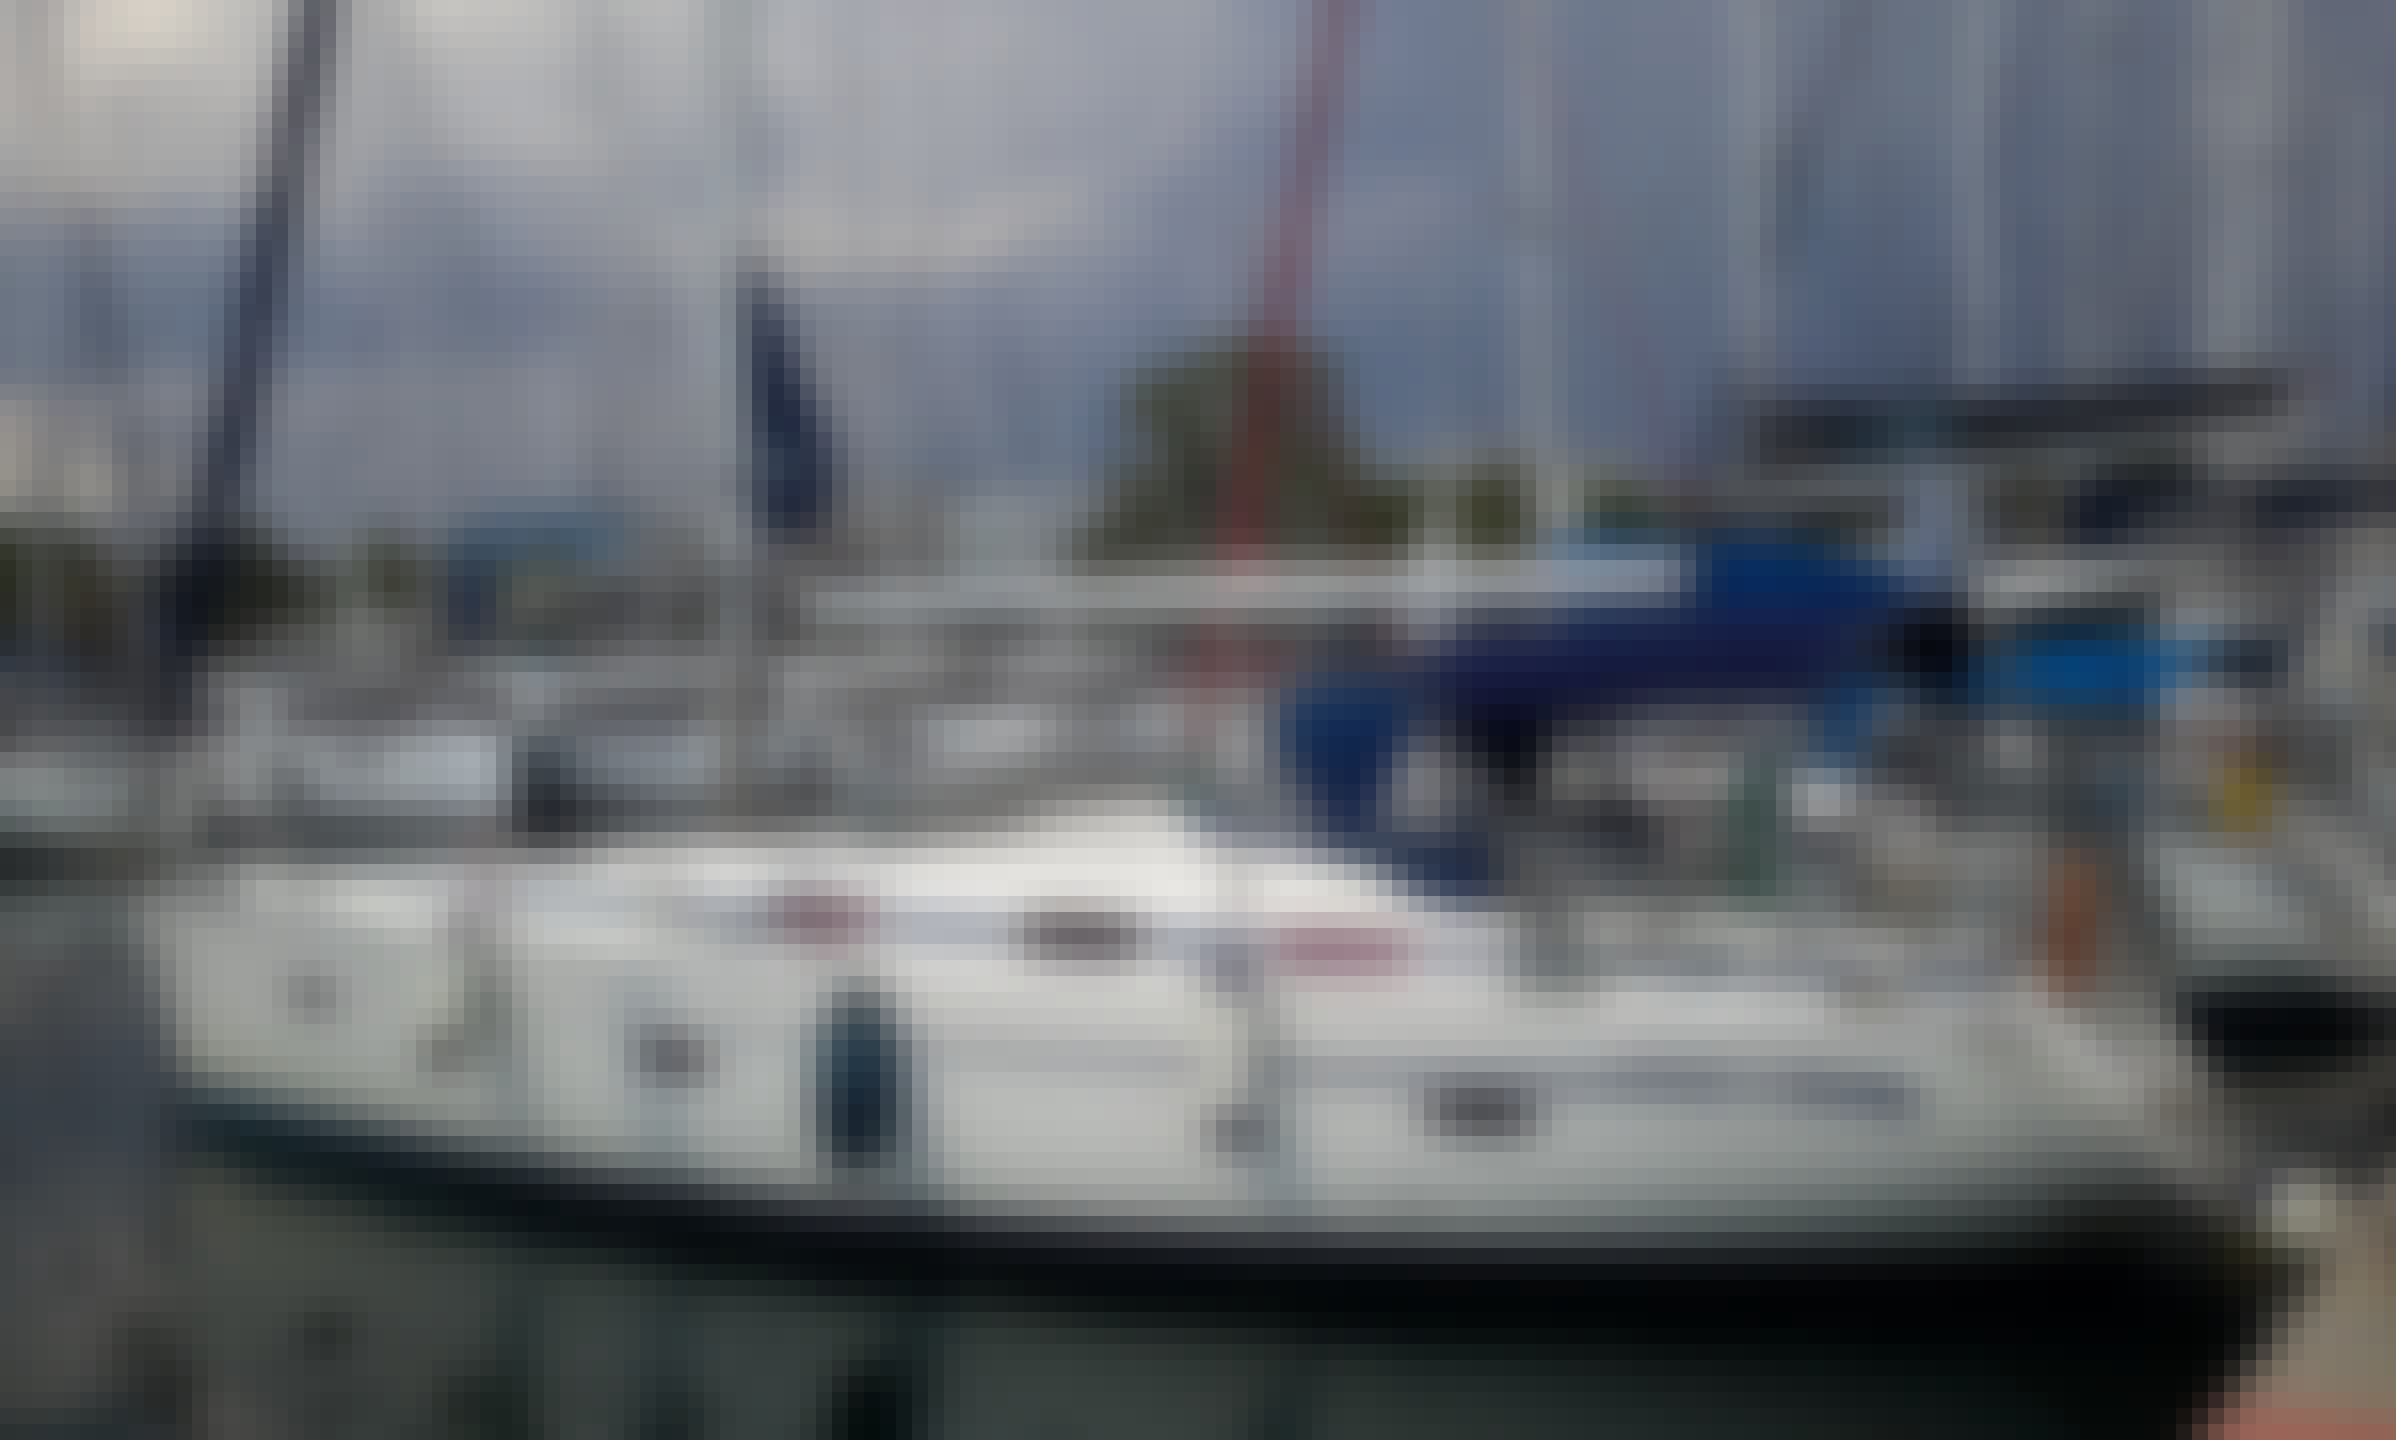 Bavaria 39 Cruiser Sailing Yacht Charter in Alimos, Greece